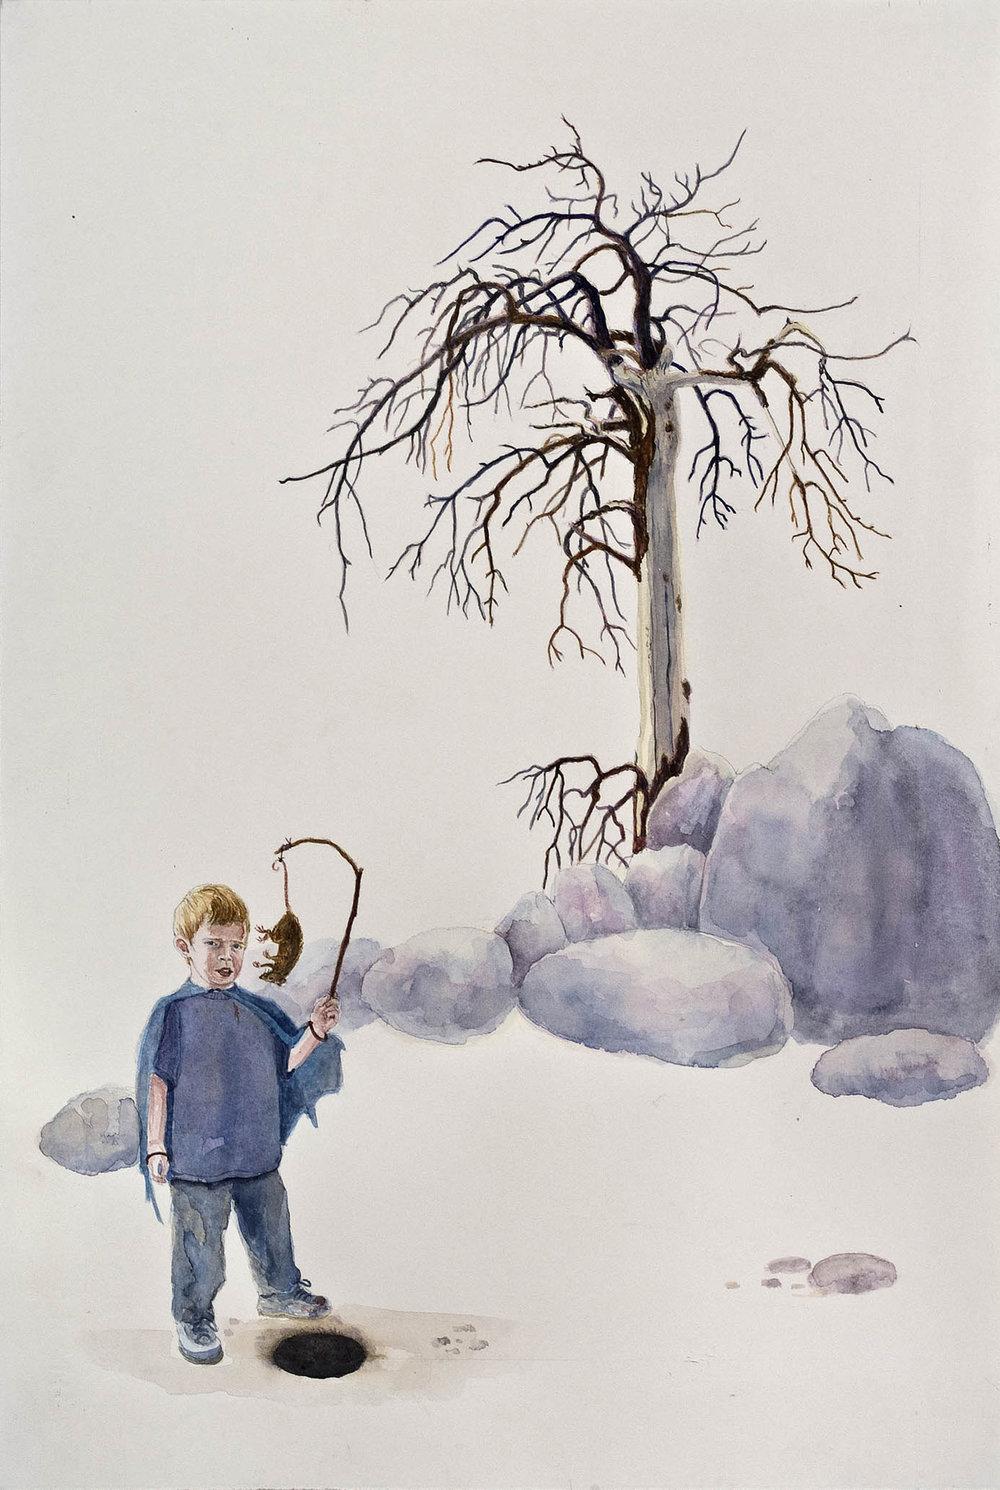 "Reward, 16.75"" x 11.75"", watercolor & gouache on paper, 2010"